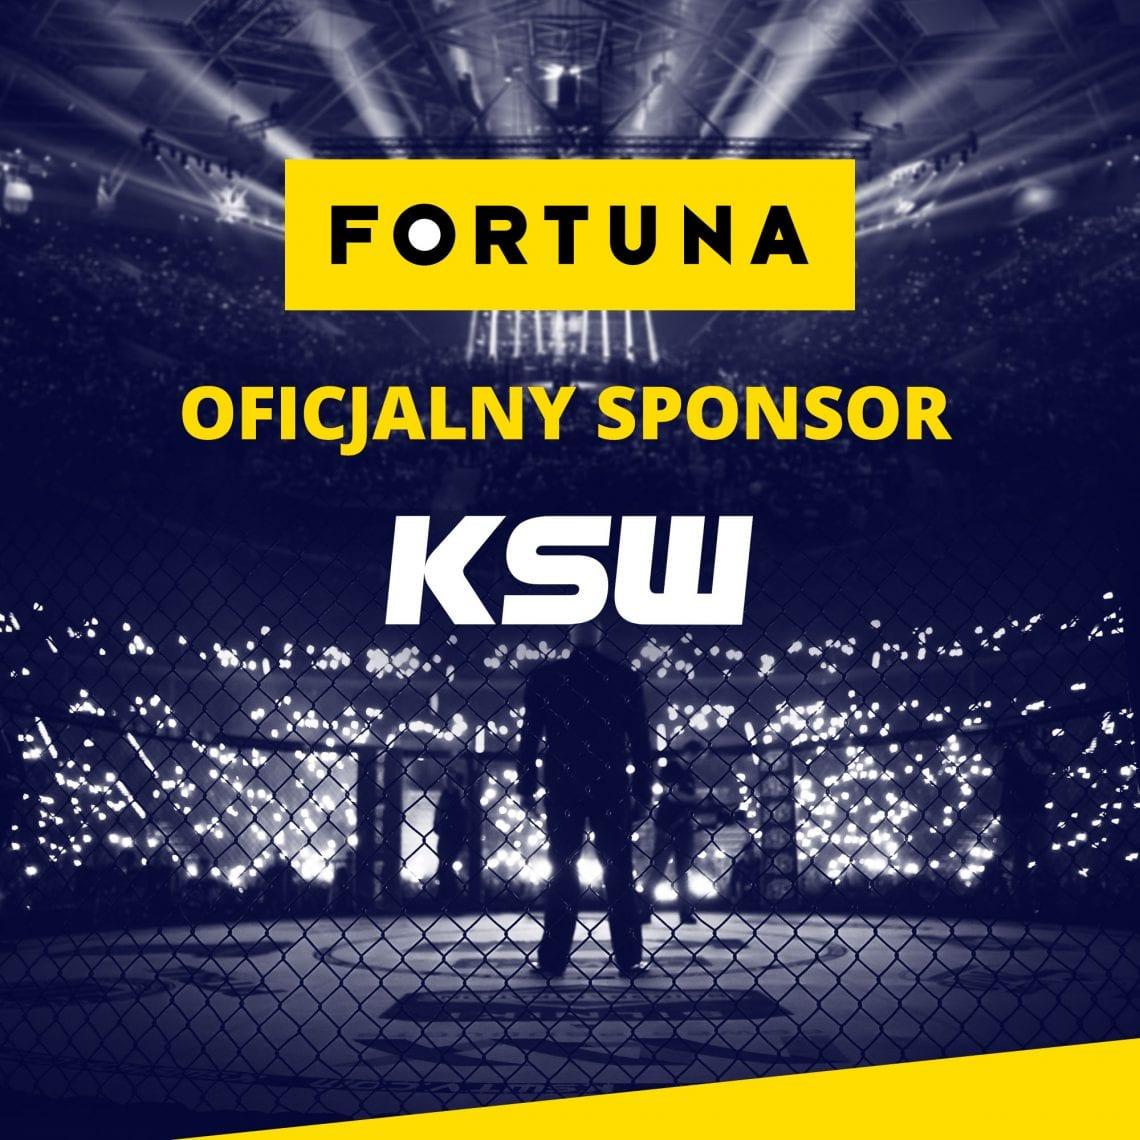 Fortuna_KSW